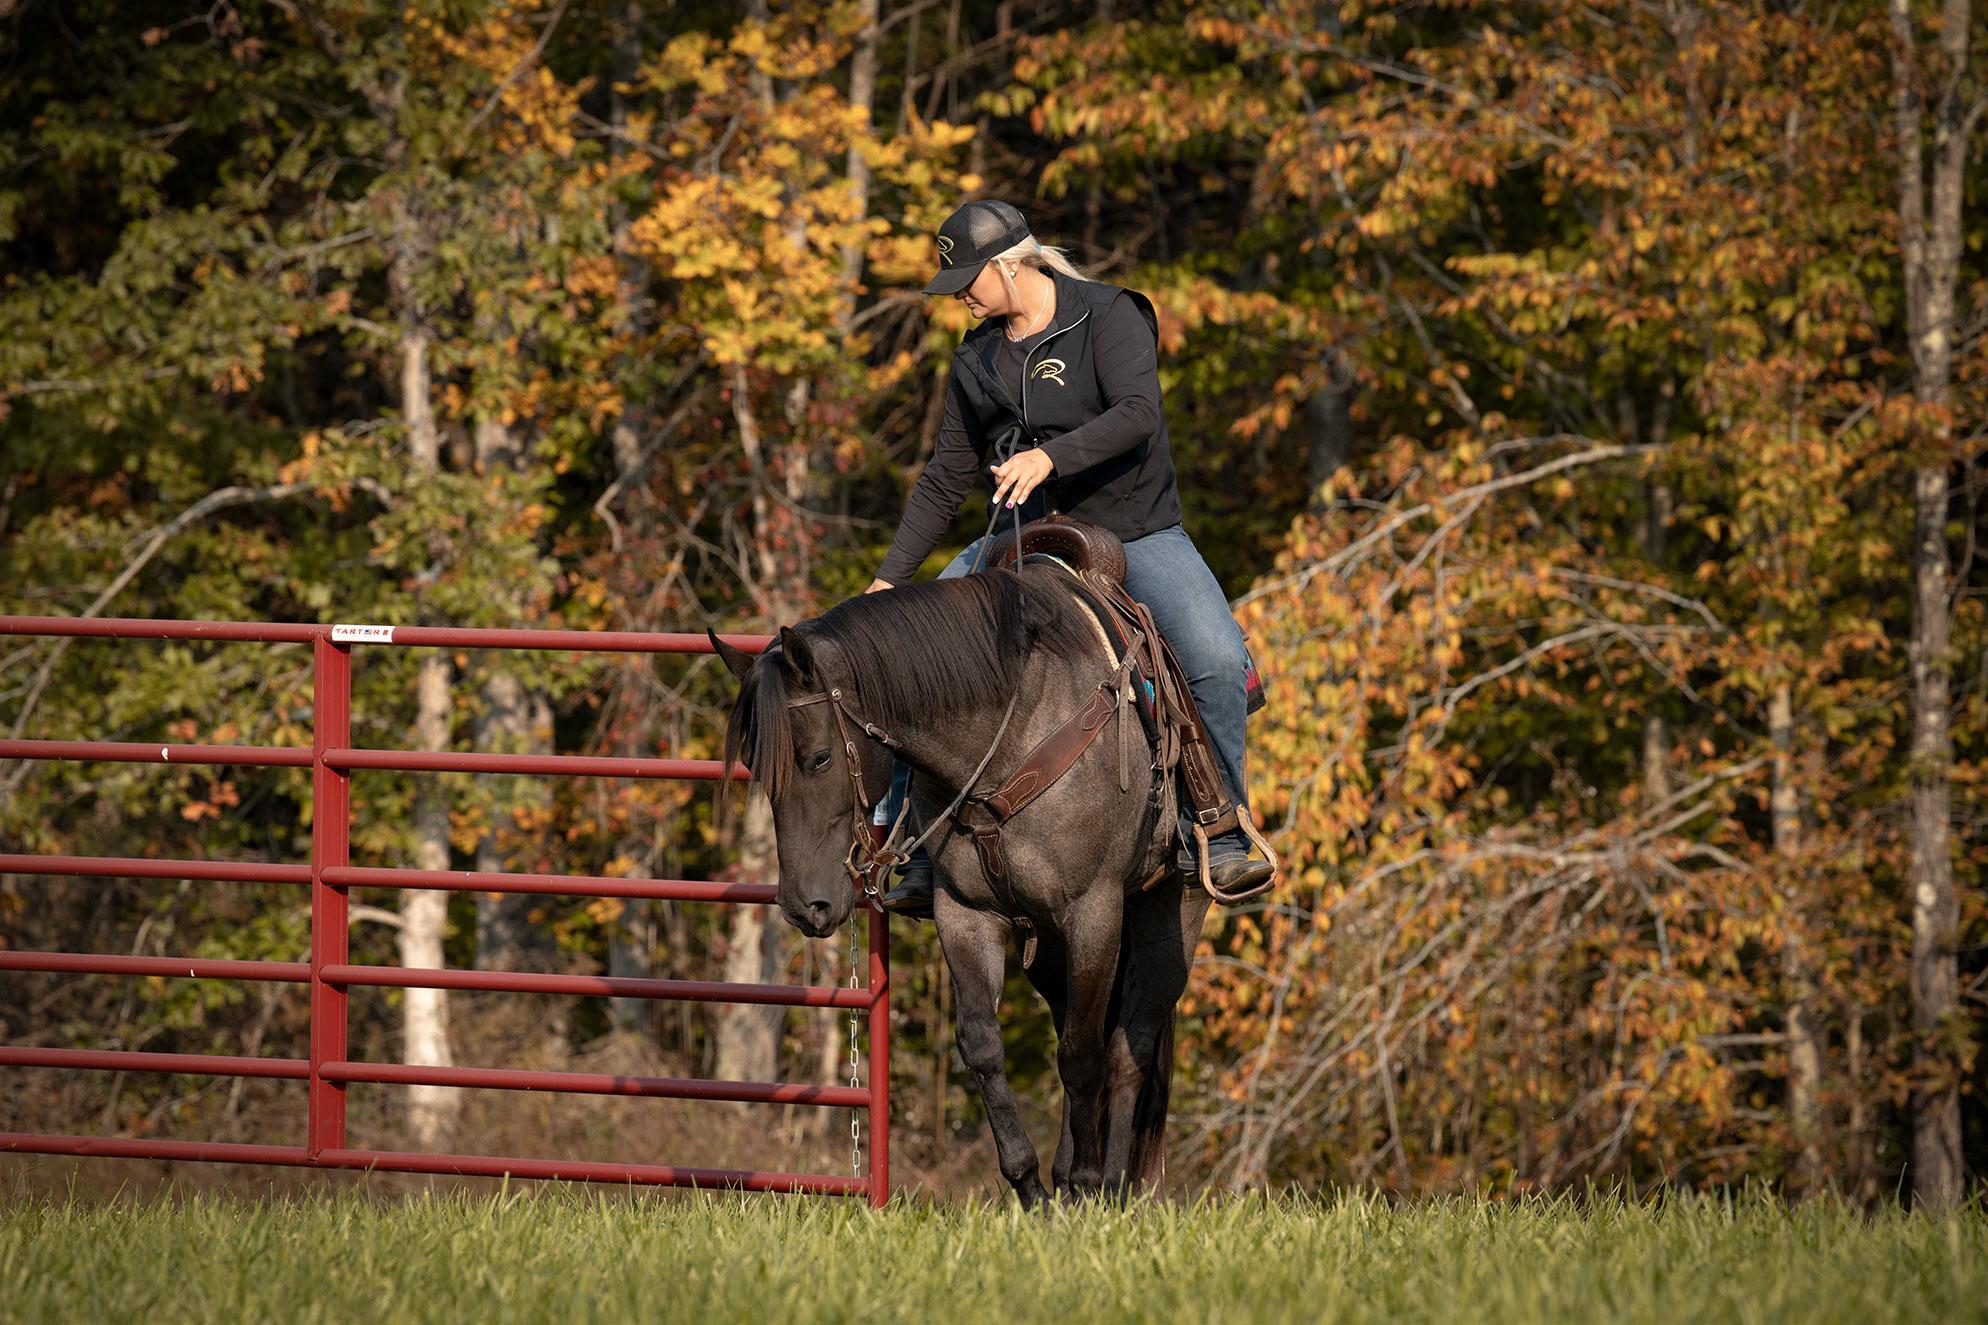 022-Gunsmoke-Luxury-Trail-Horse-For-Sale